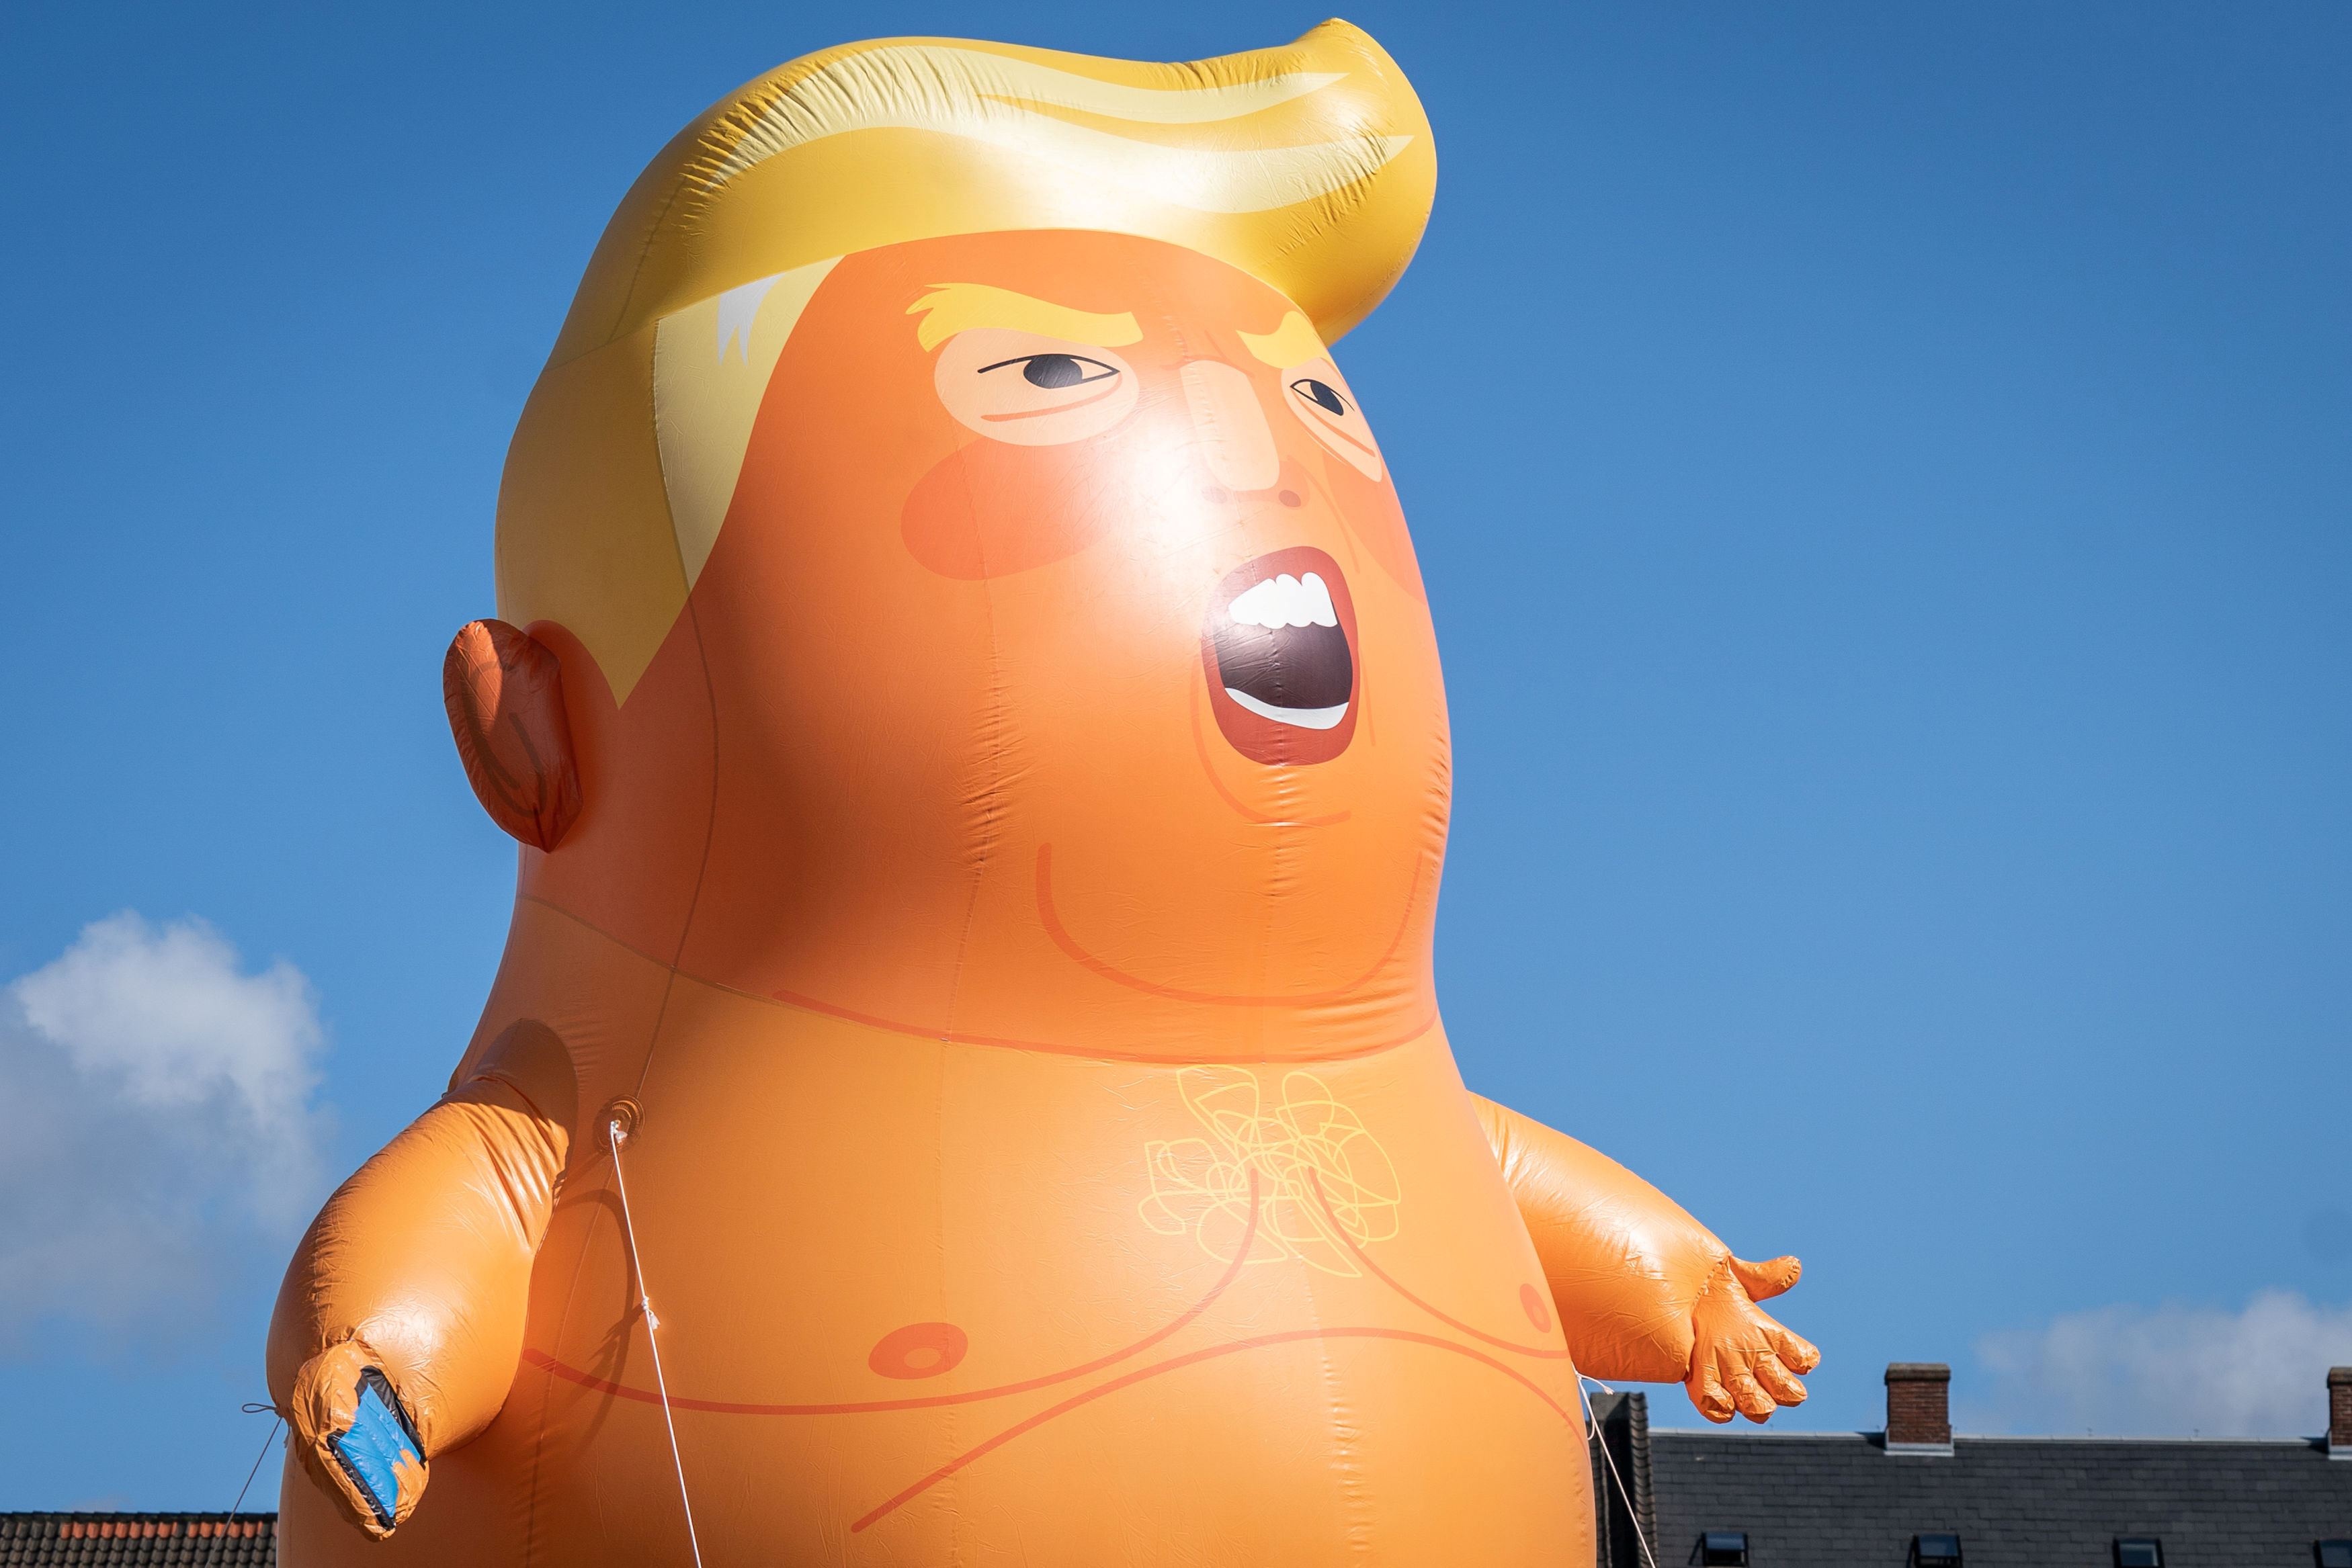 Baby Trump blimp flies at Kongens Nytorv, despite the fact that the U.S. President Donald Trump has cancelled his visit to Denmark, in Copenhagen, Denmark, September 2, 2019. Ritzau Scanpix/via REUTERS